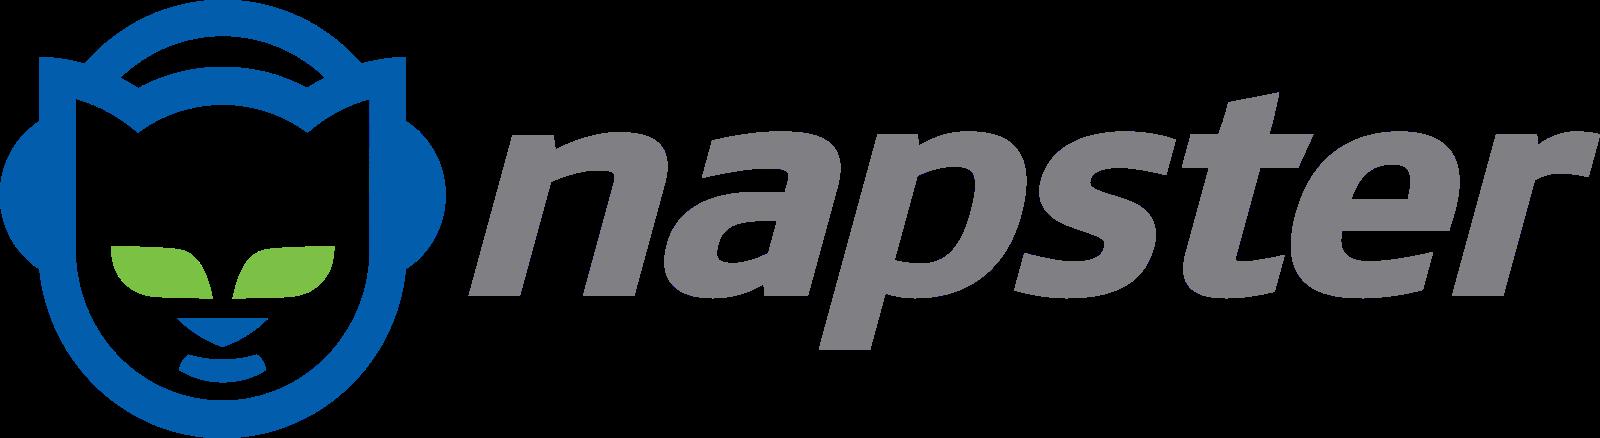 napster logo 2 2 - Napster Logo